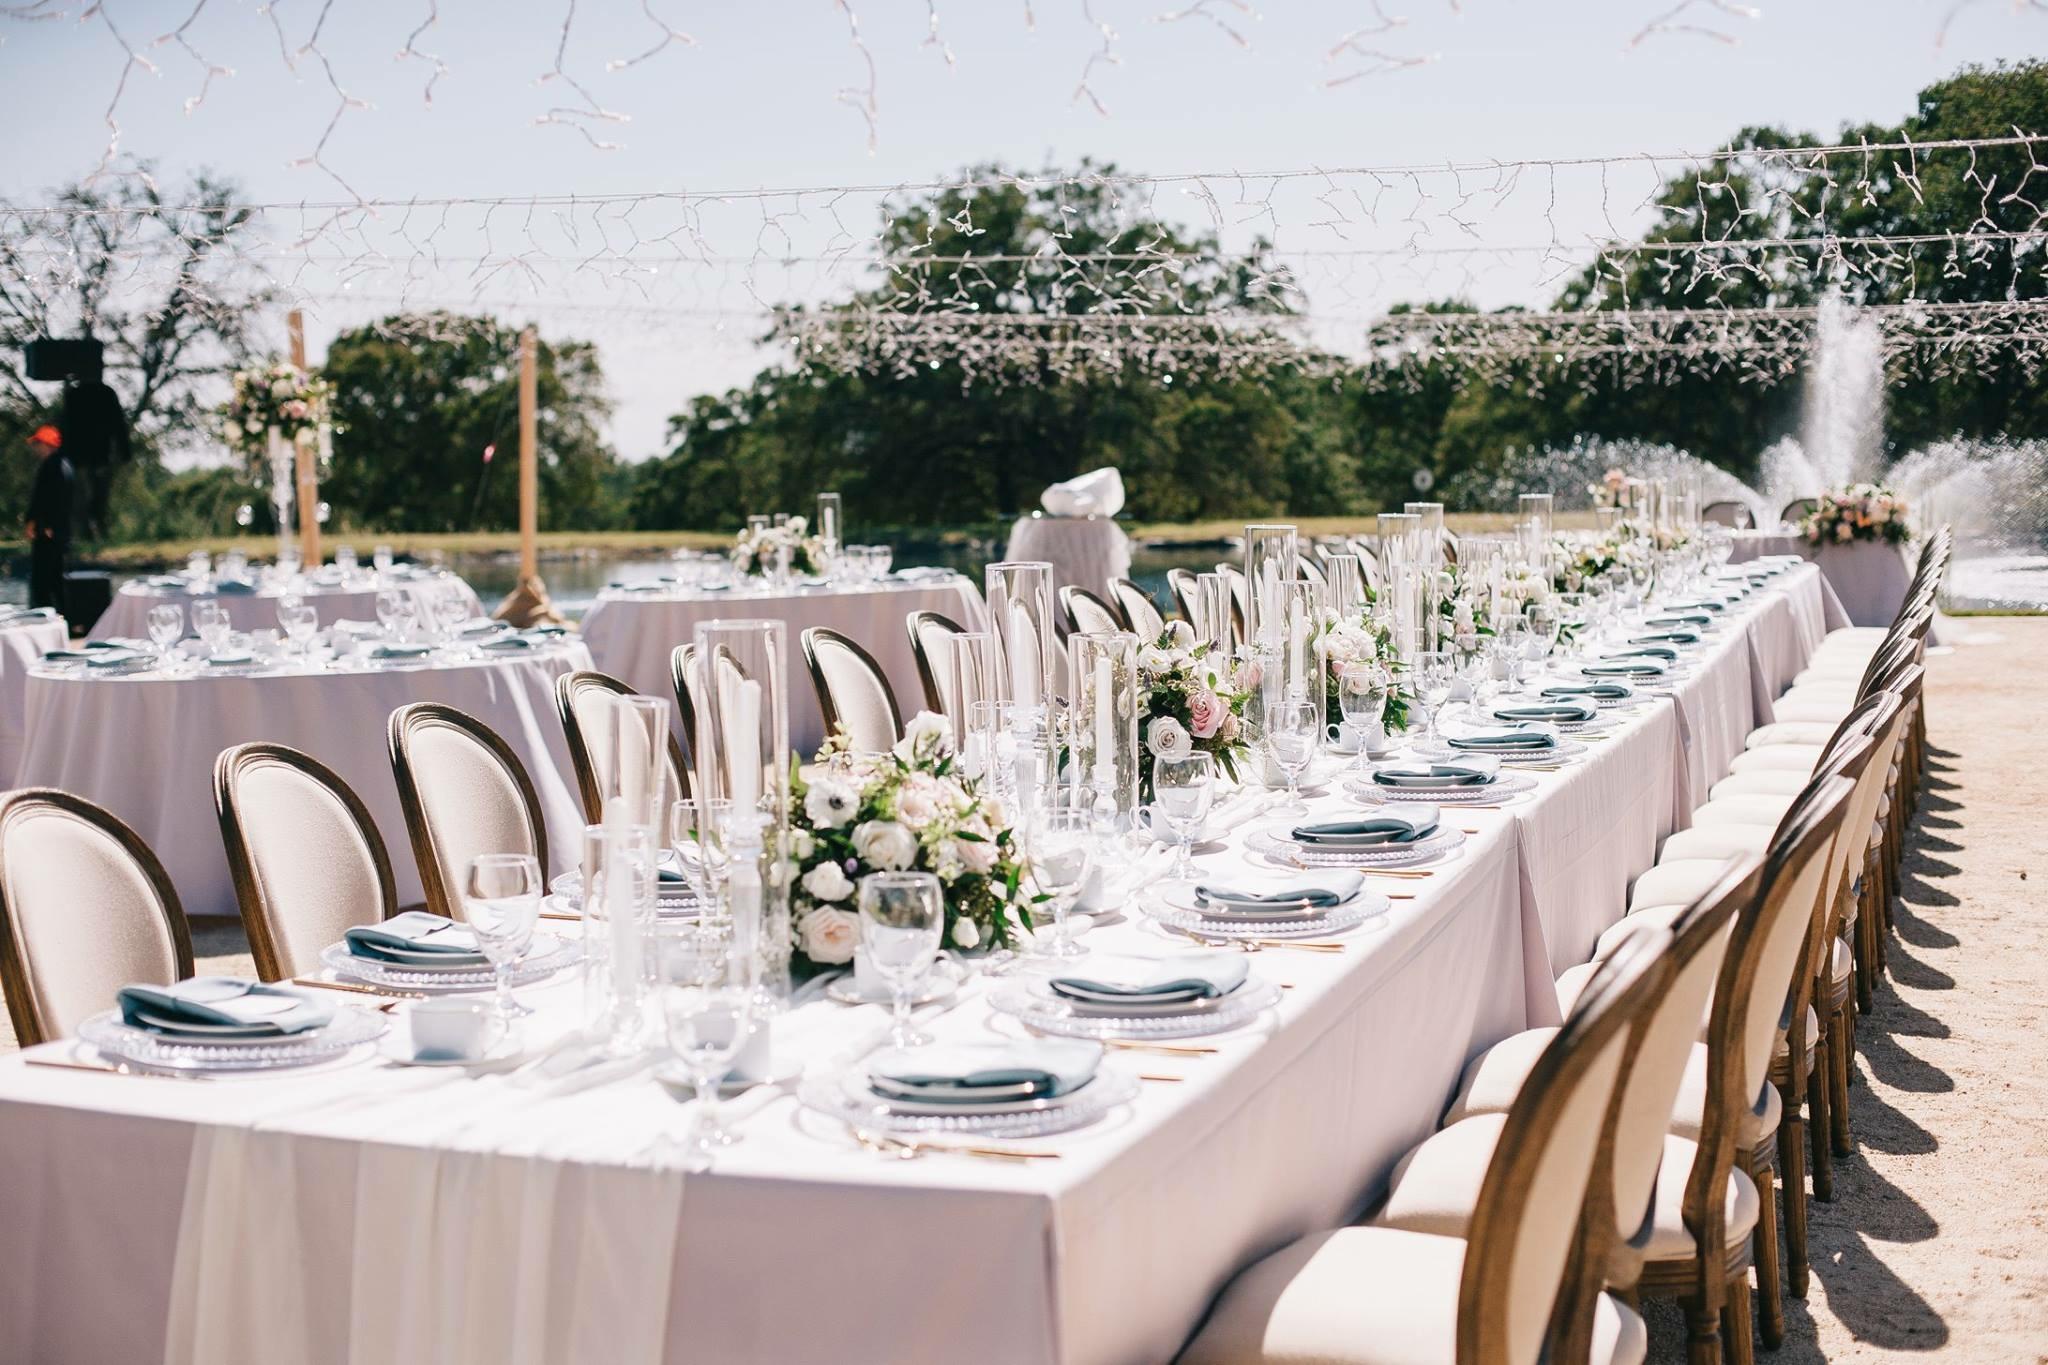 Violette-fleurs-event-design-roseville-anna-perevertaylo-rancho-robles-vinyards-Detail-Design-Beautiful-Luxury.JPG